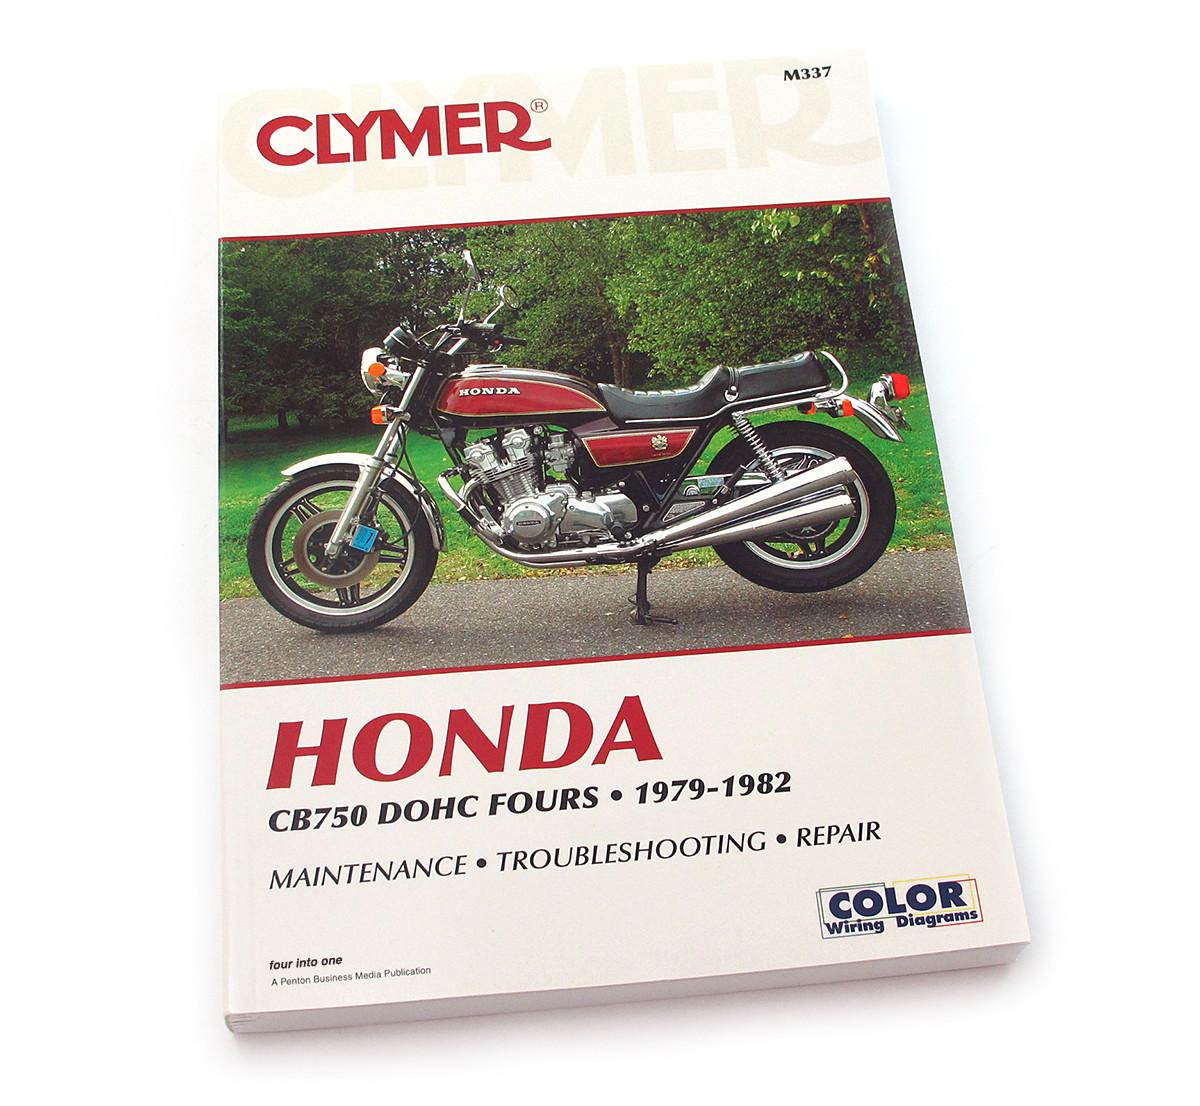 hight resolution of clymer manual honda cb750 dohc fours 1979 1982